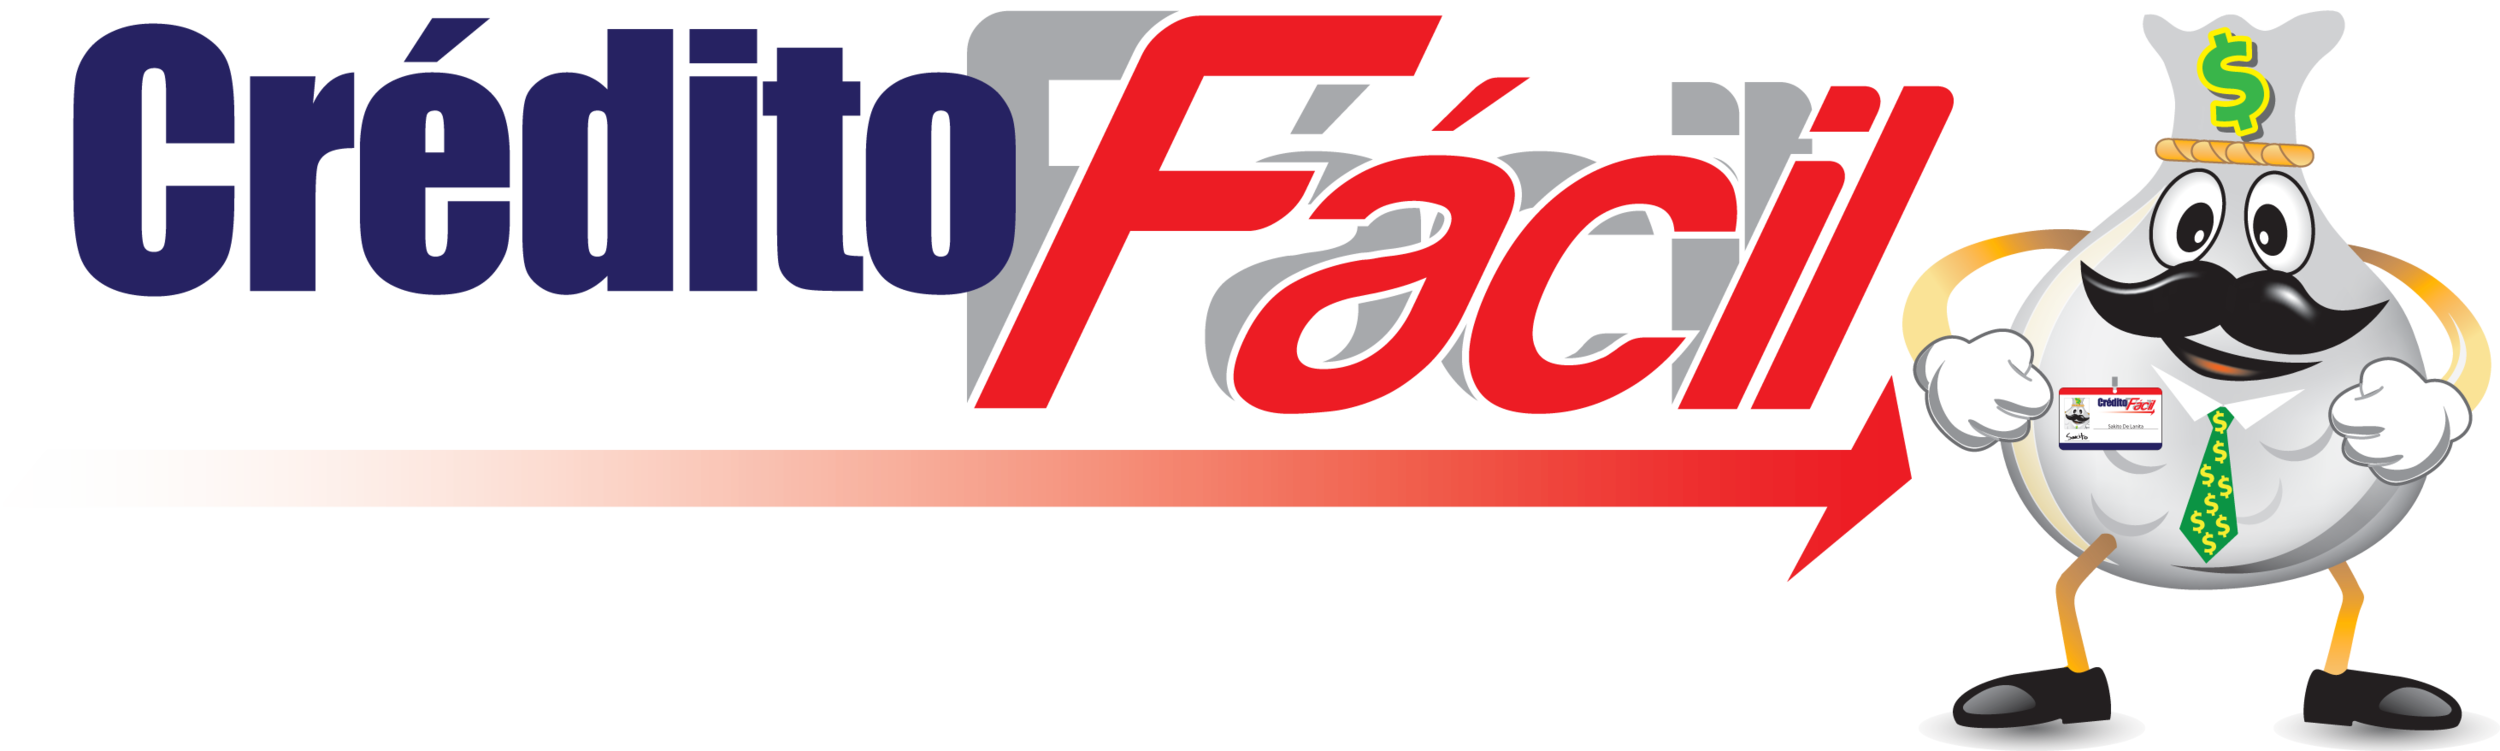 Logo Credito Facil copy.png